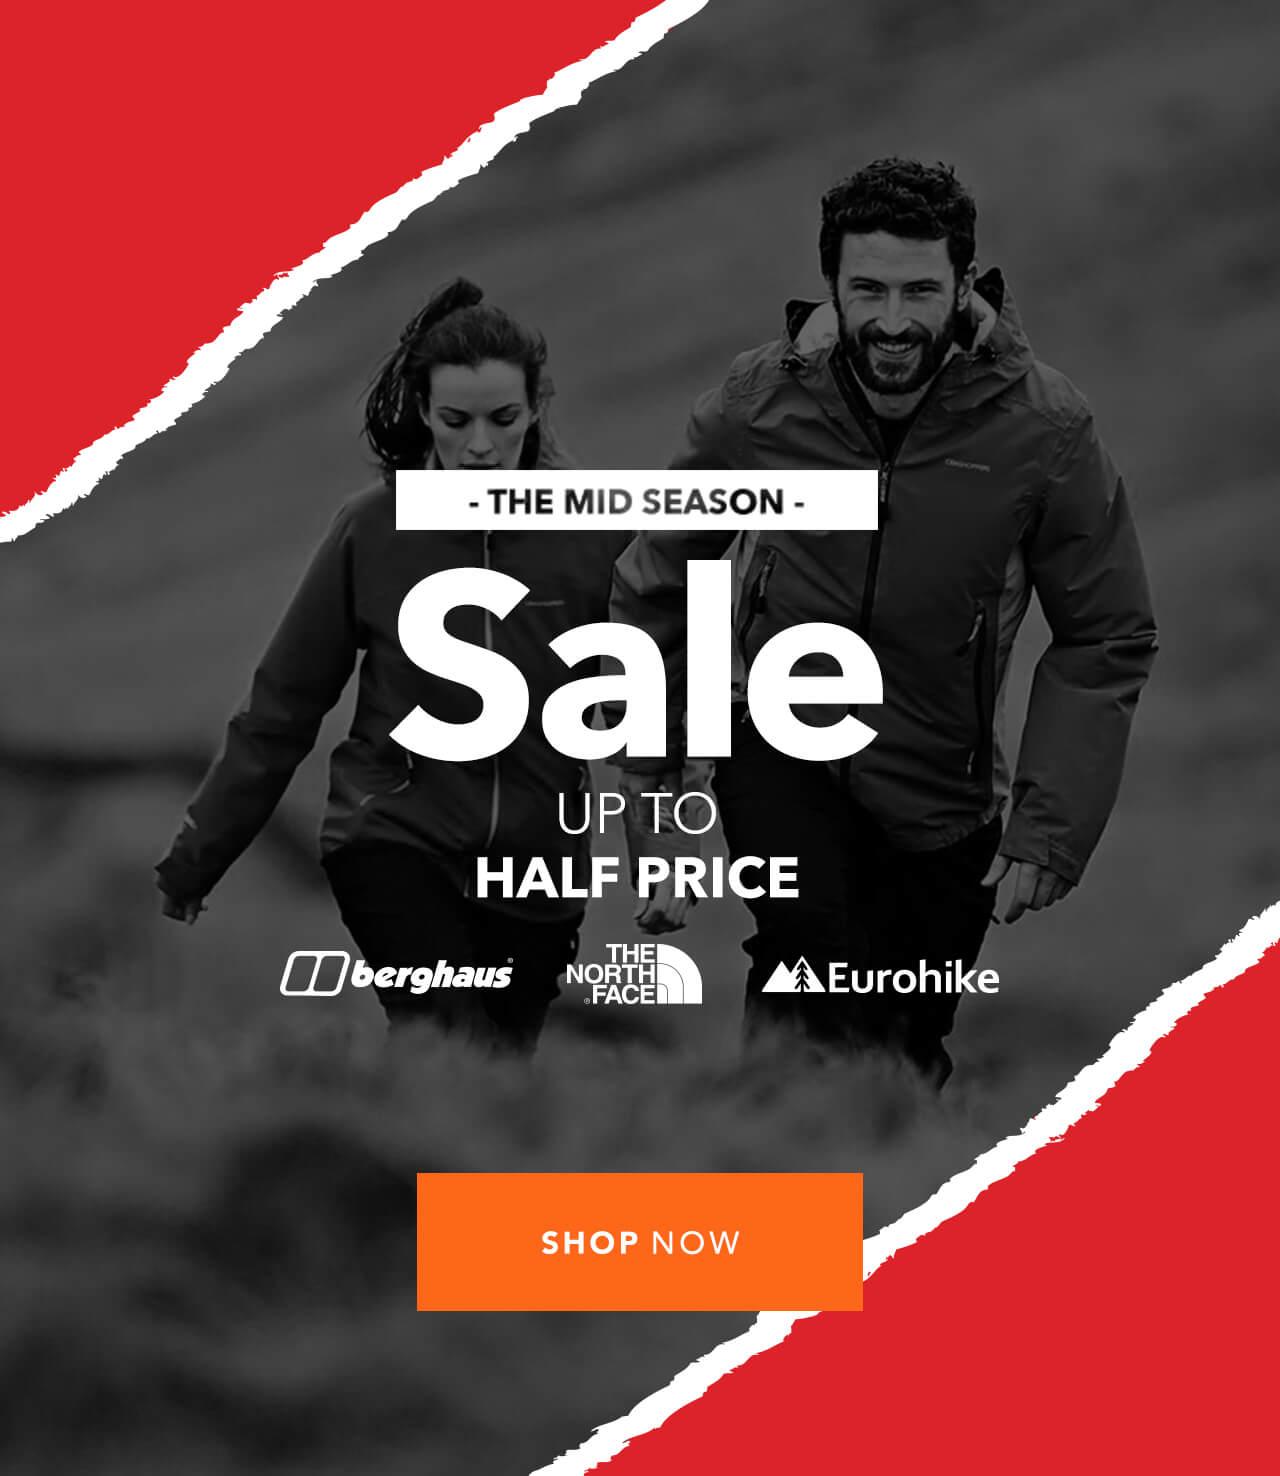 The Mid Season Sale | Up To Half Price